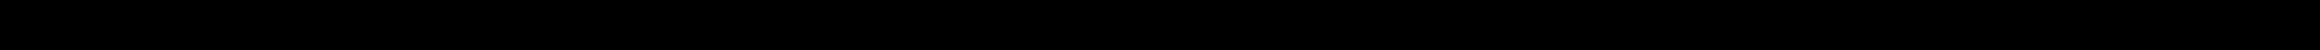 MANN-FILTER 1F0 129 620, 3C0 129 620 Vzduchový filter